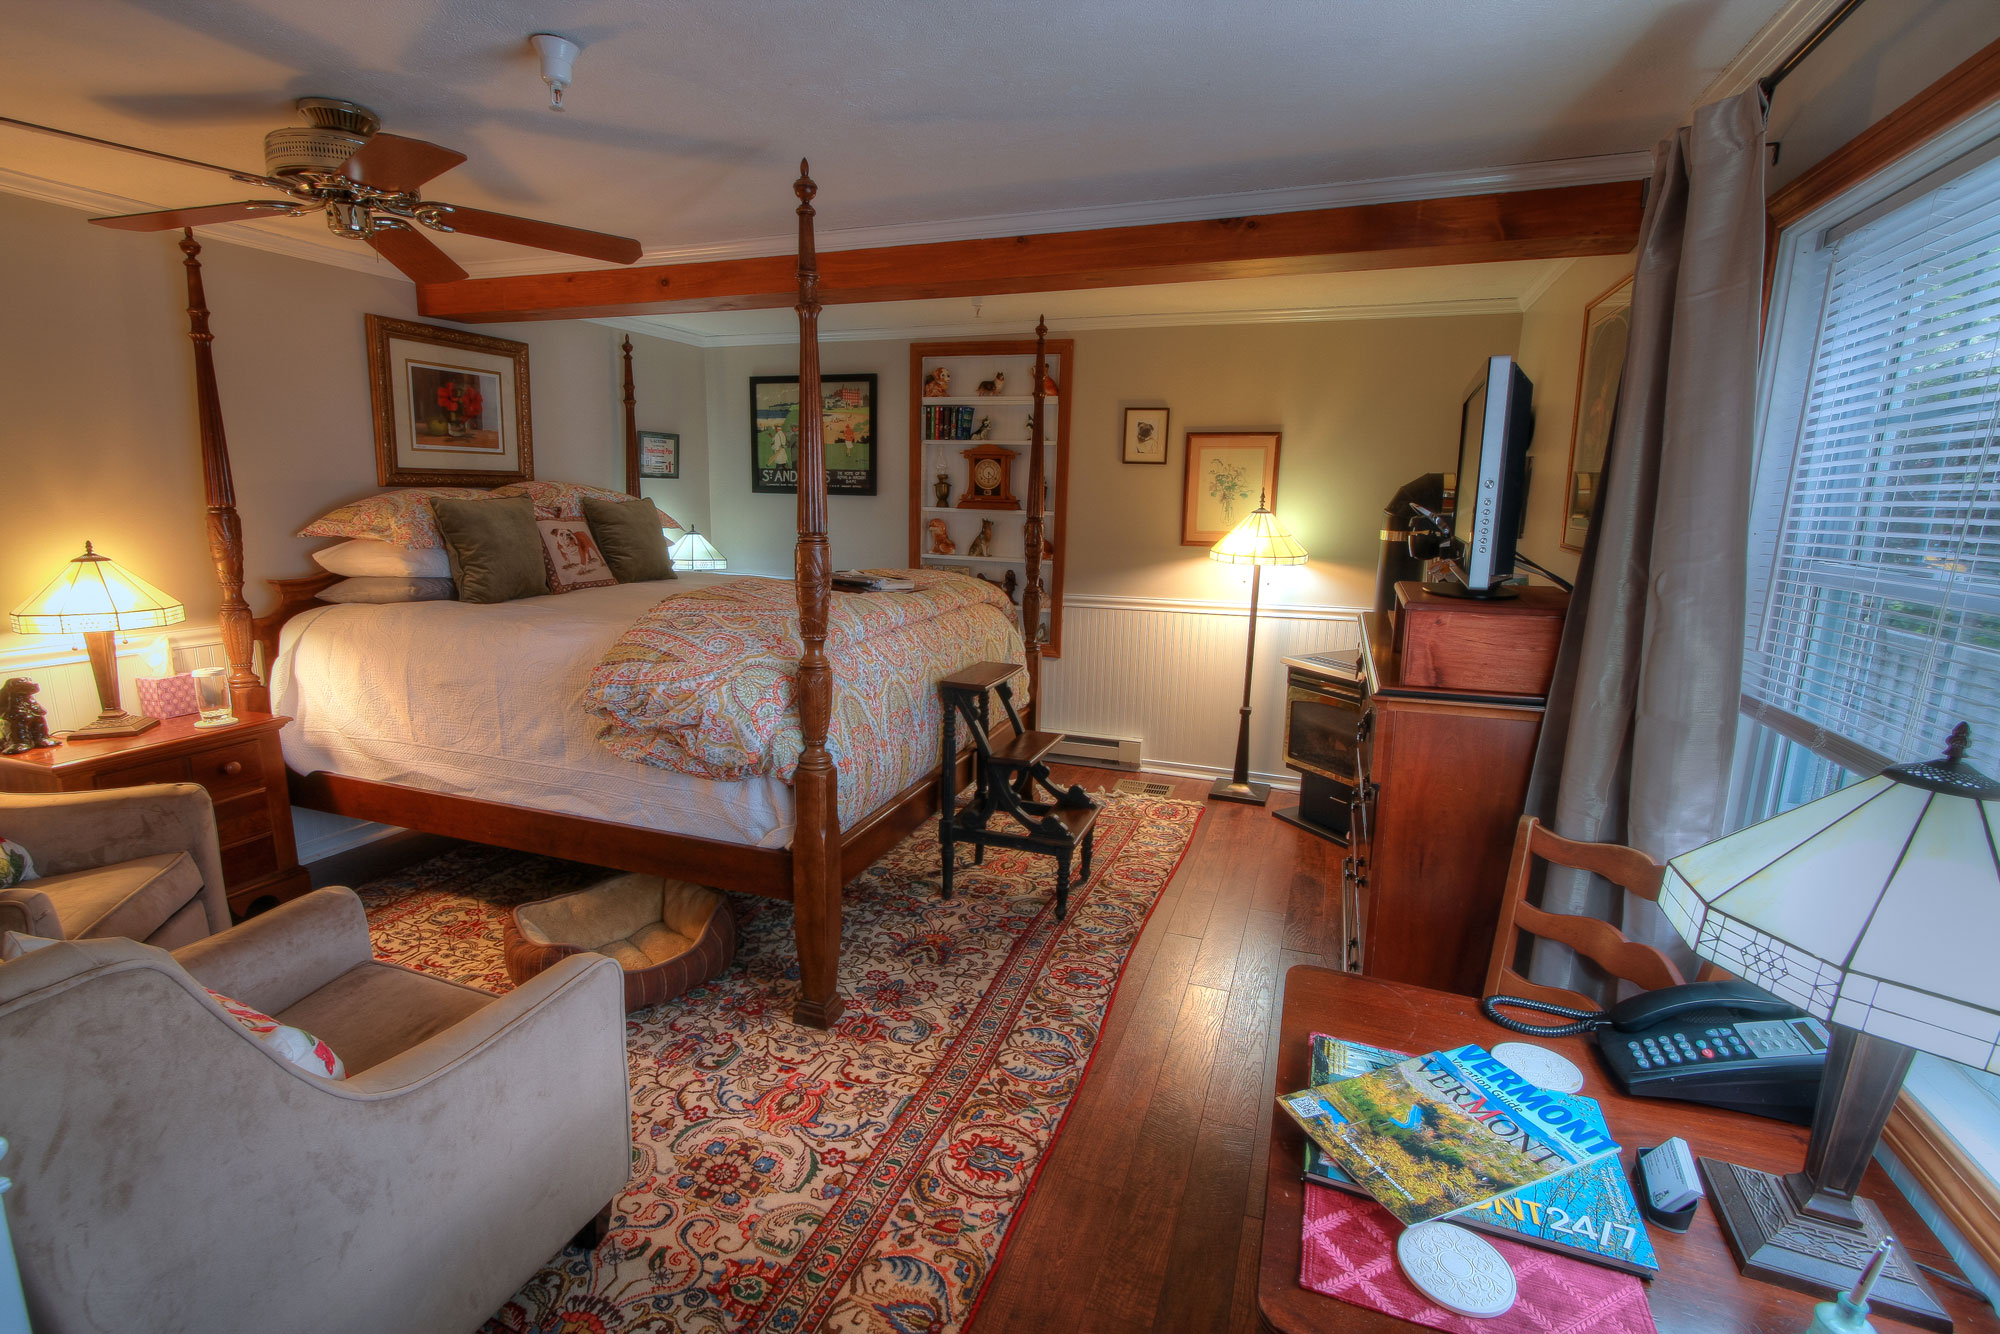 The Honeymoon Suite Phineas Swann Bed And Breakfast Inn